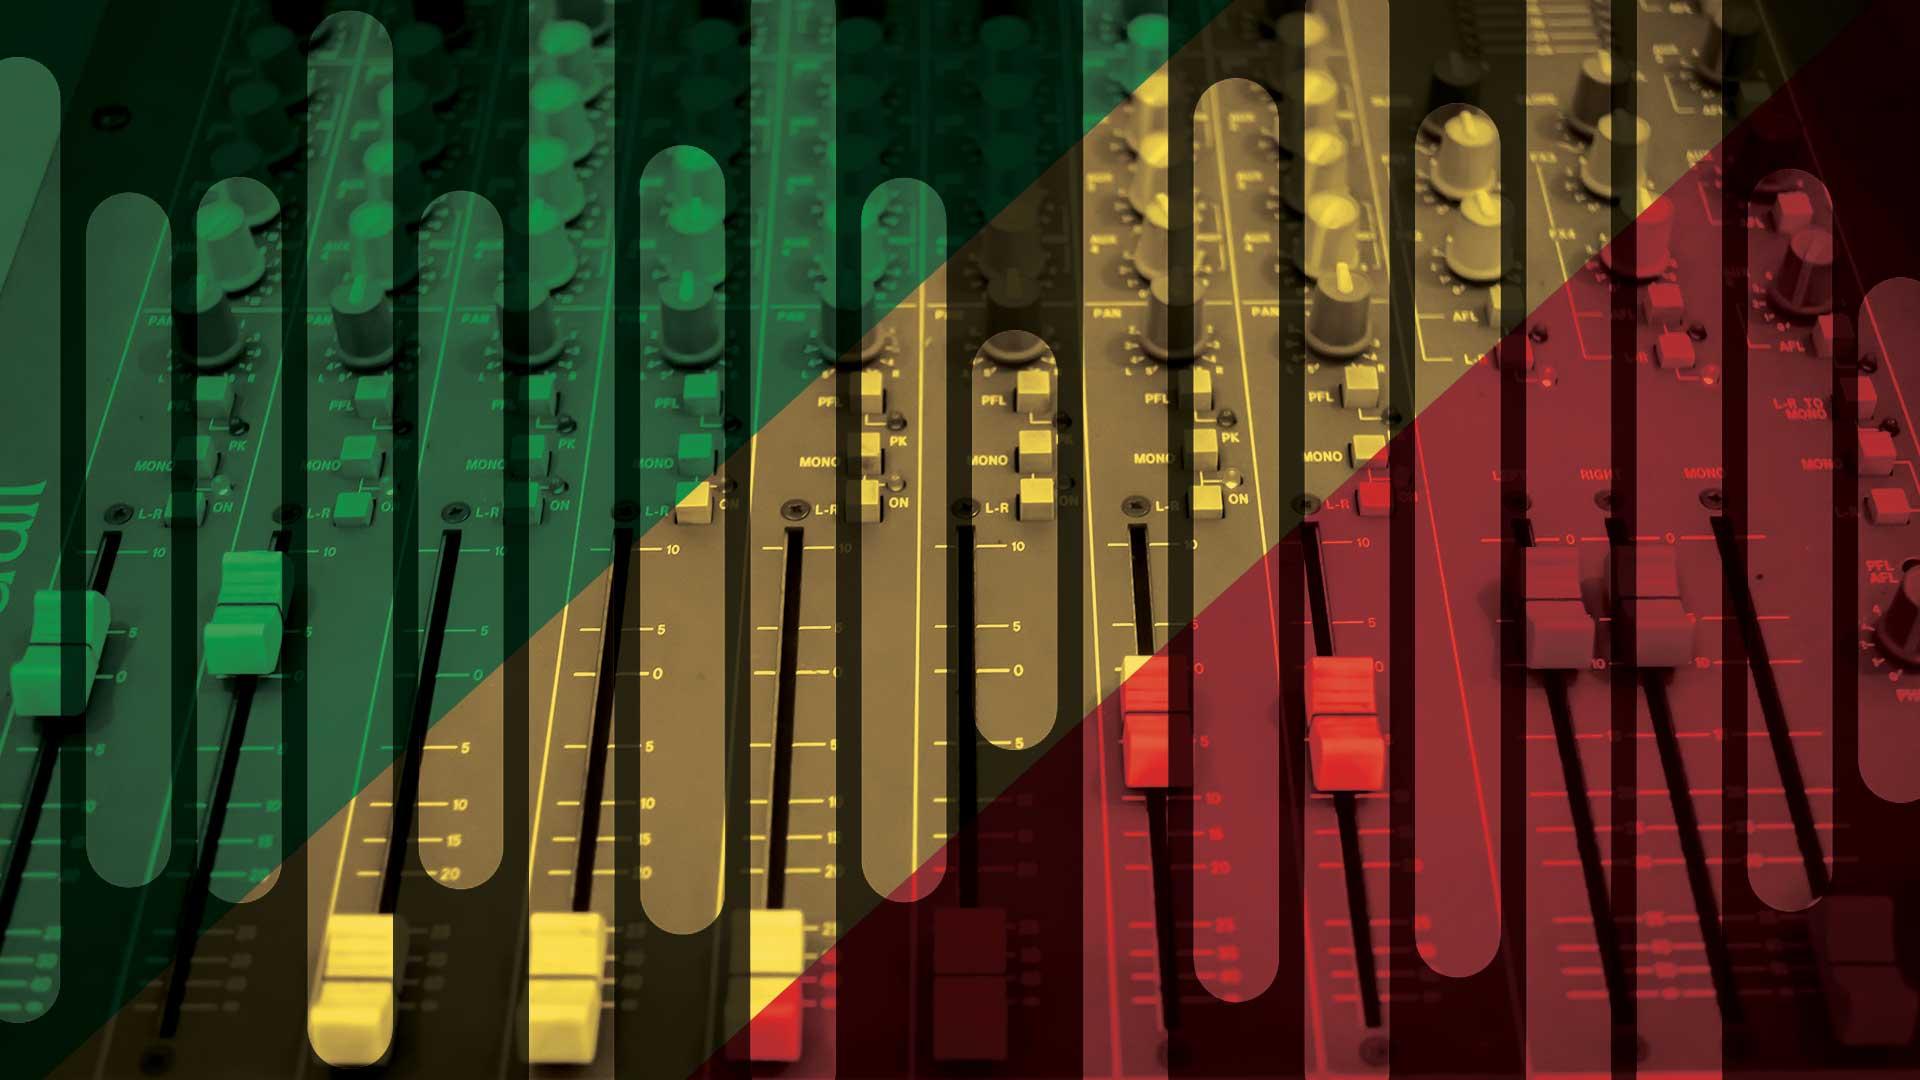 Voice-Over Services Republic of the Congo - Voquent